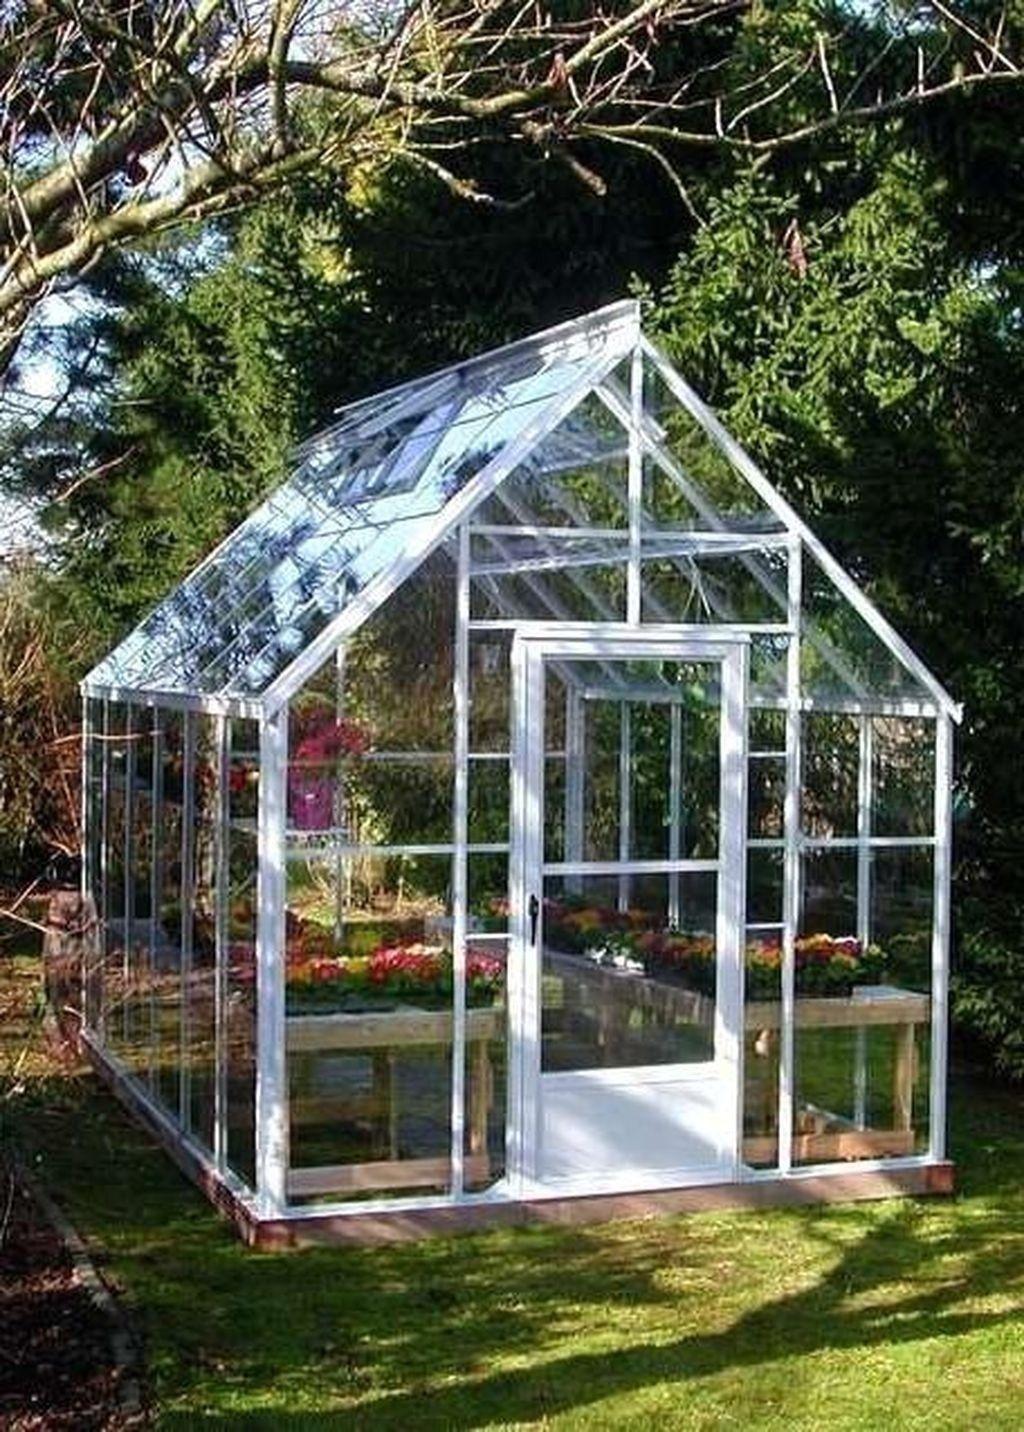 Best Greenhouse Design Ideas For Home Backyard Frugal Living Backyard Greenhouse Greenhouses For Sale Greenhouse Backyard greenhouse for sale